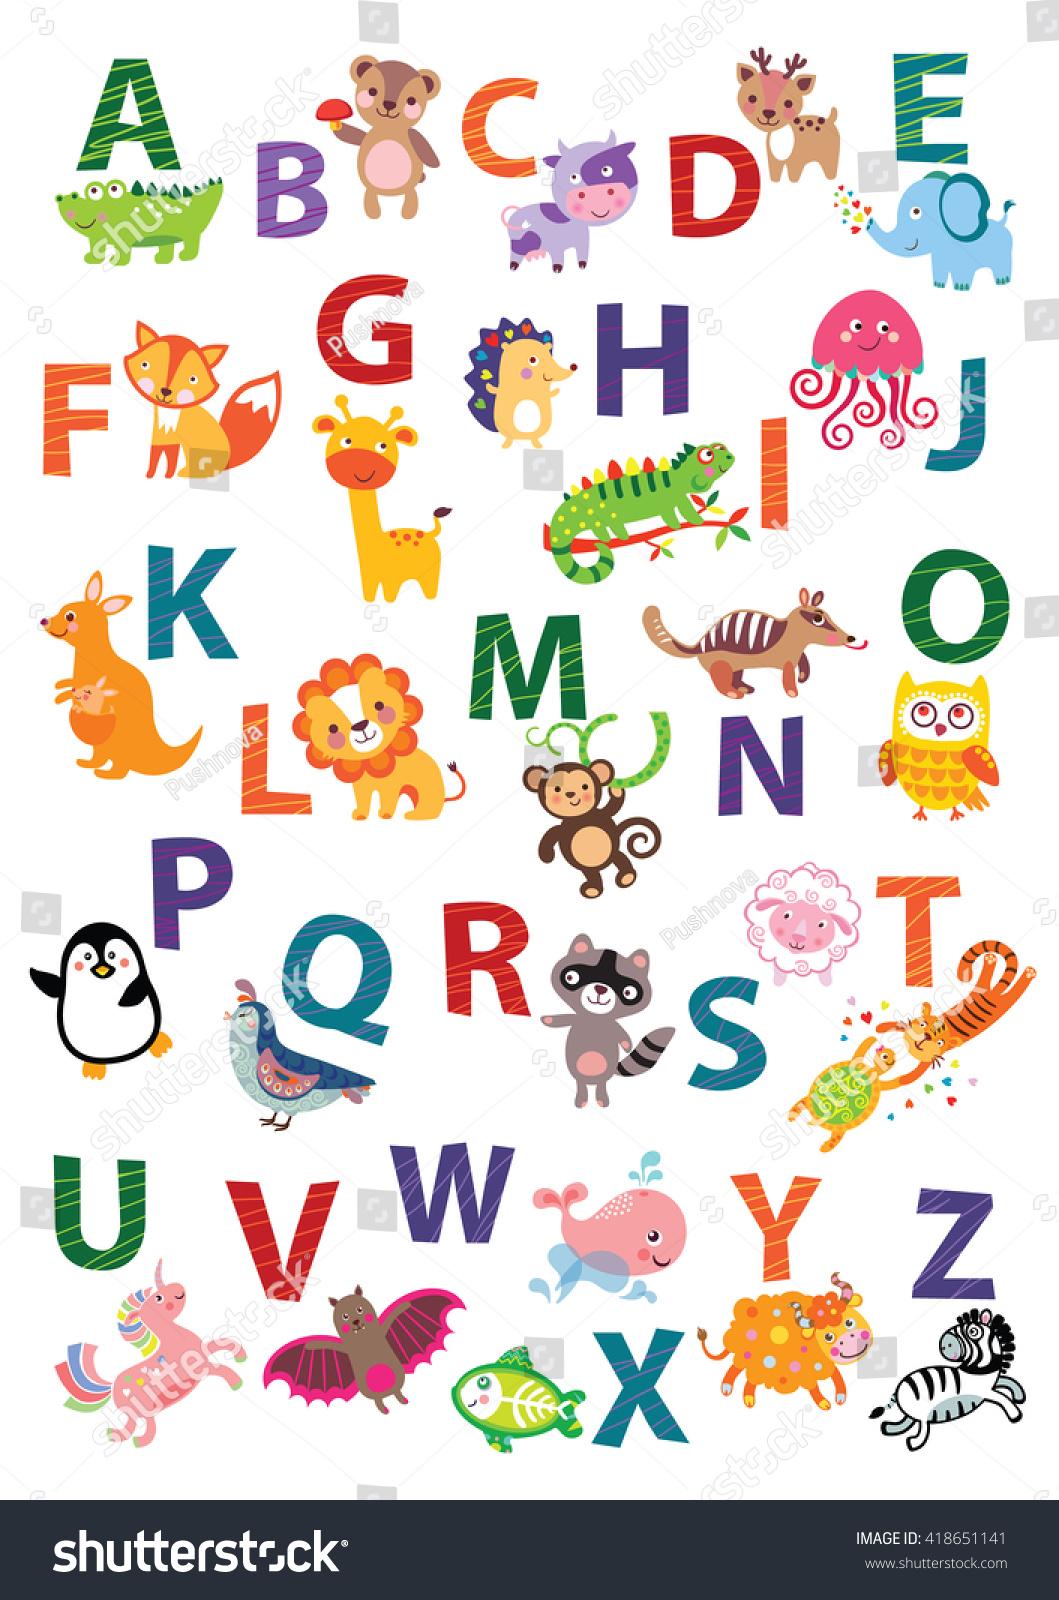 Cute Animal Alphabet English Alphabet Stock Photo